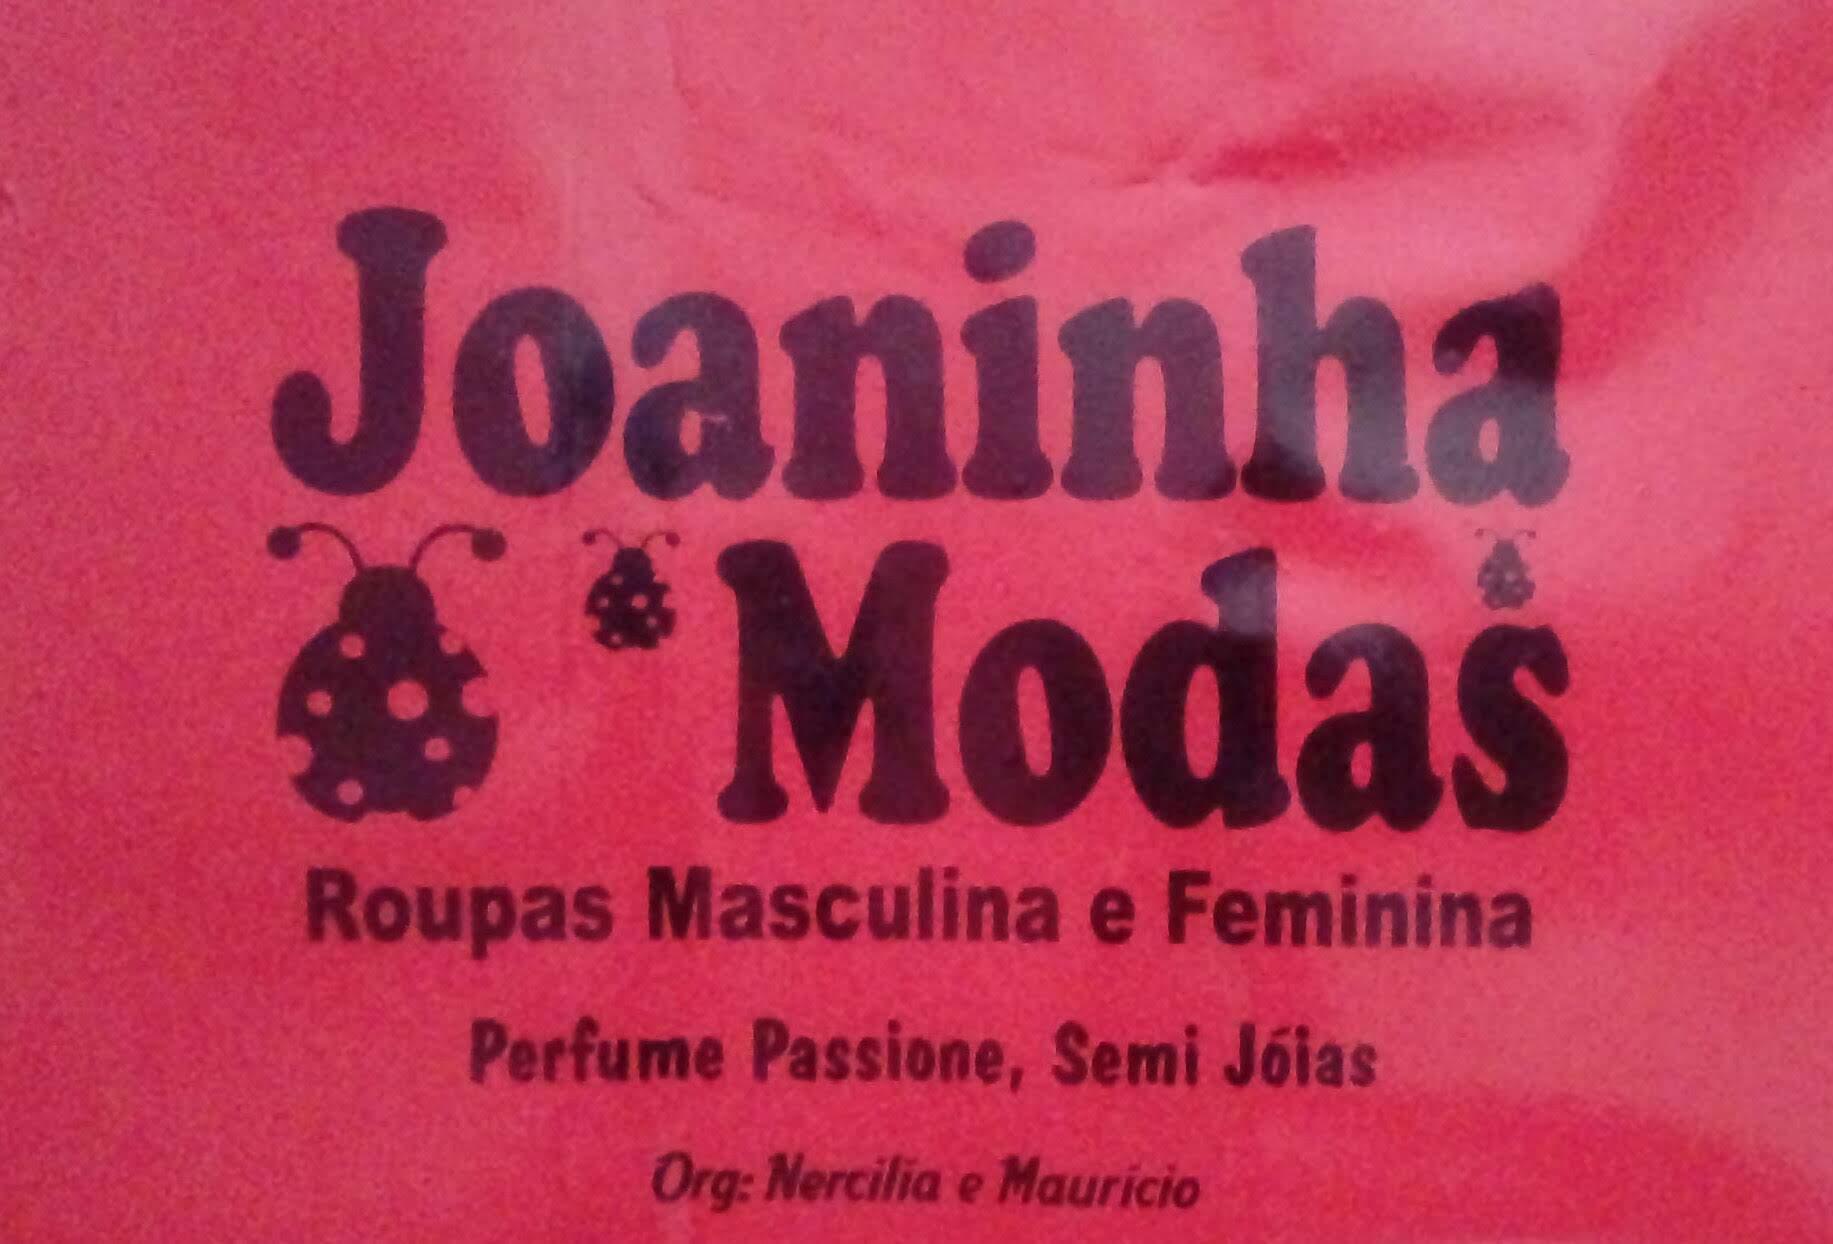 JOANINHA MODAS